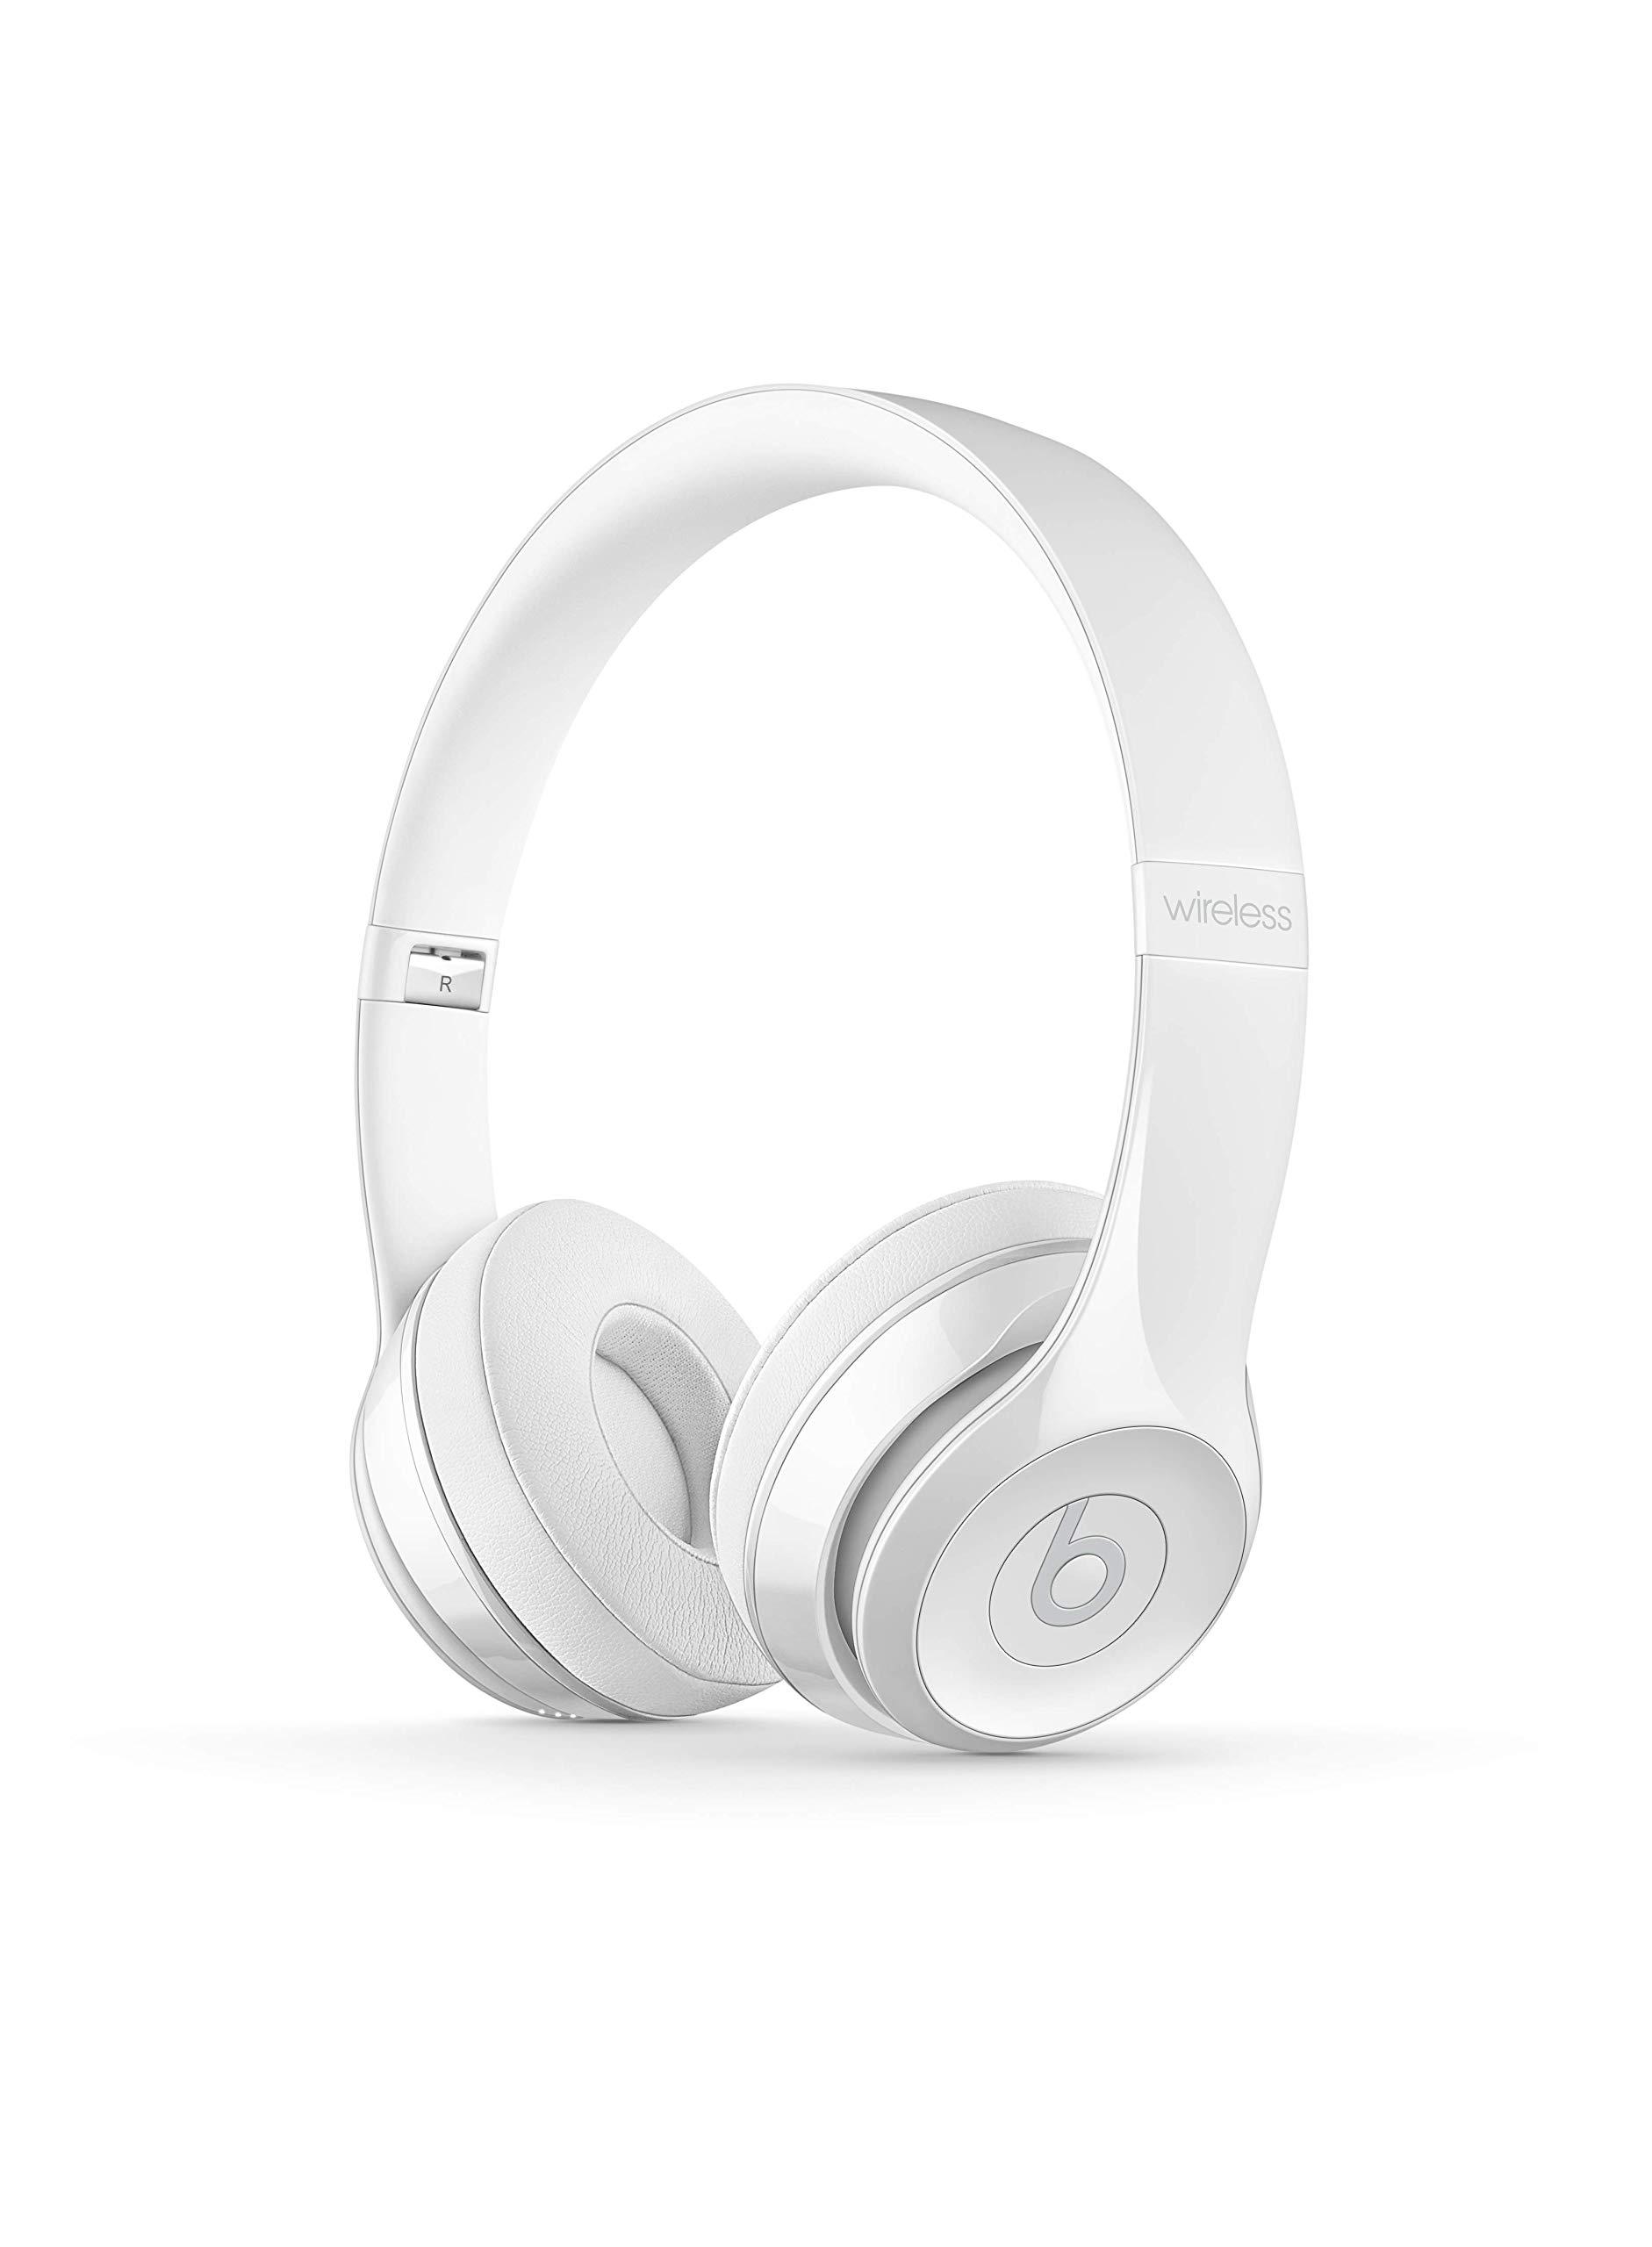 Beats Solo3 Wireless On-Ear Headphones - Gloss White by Beats